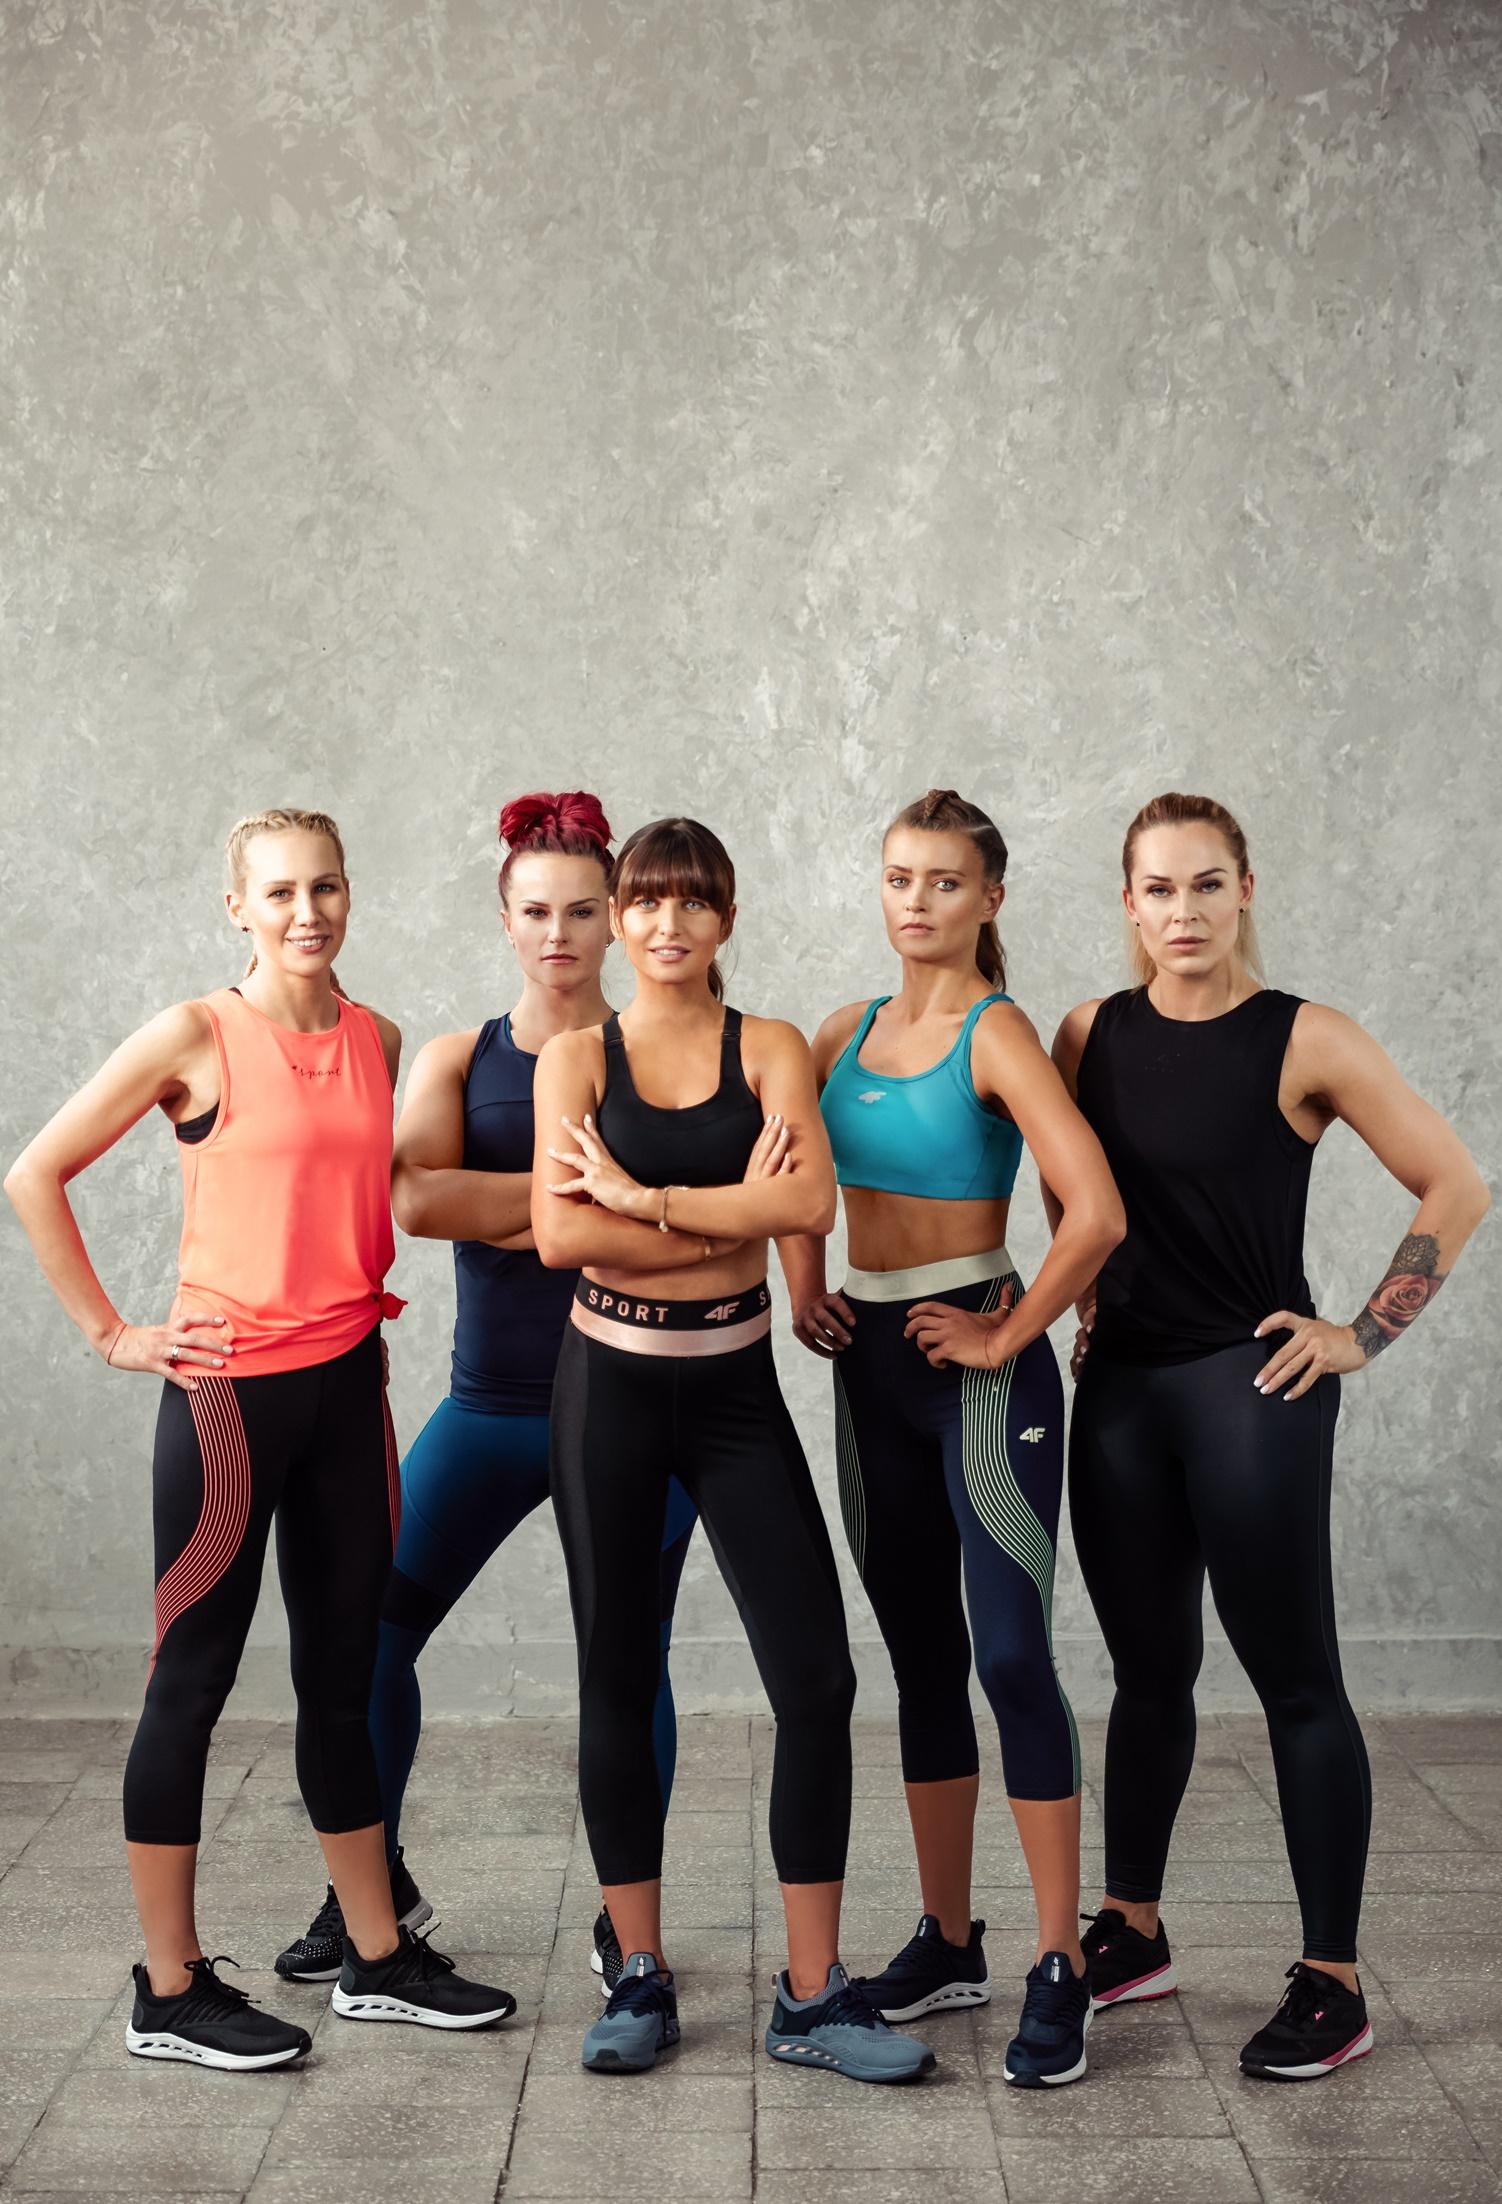 4F_fitness women (2)